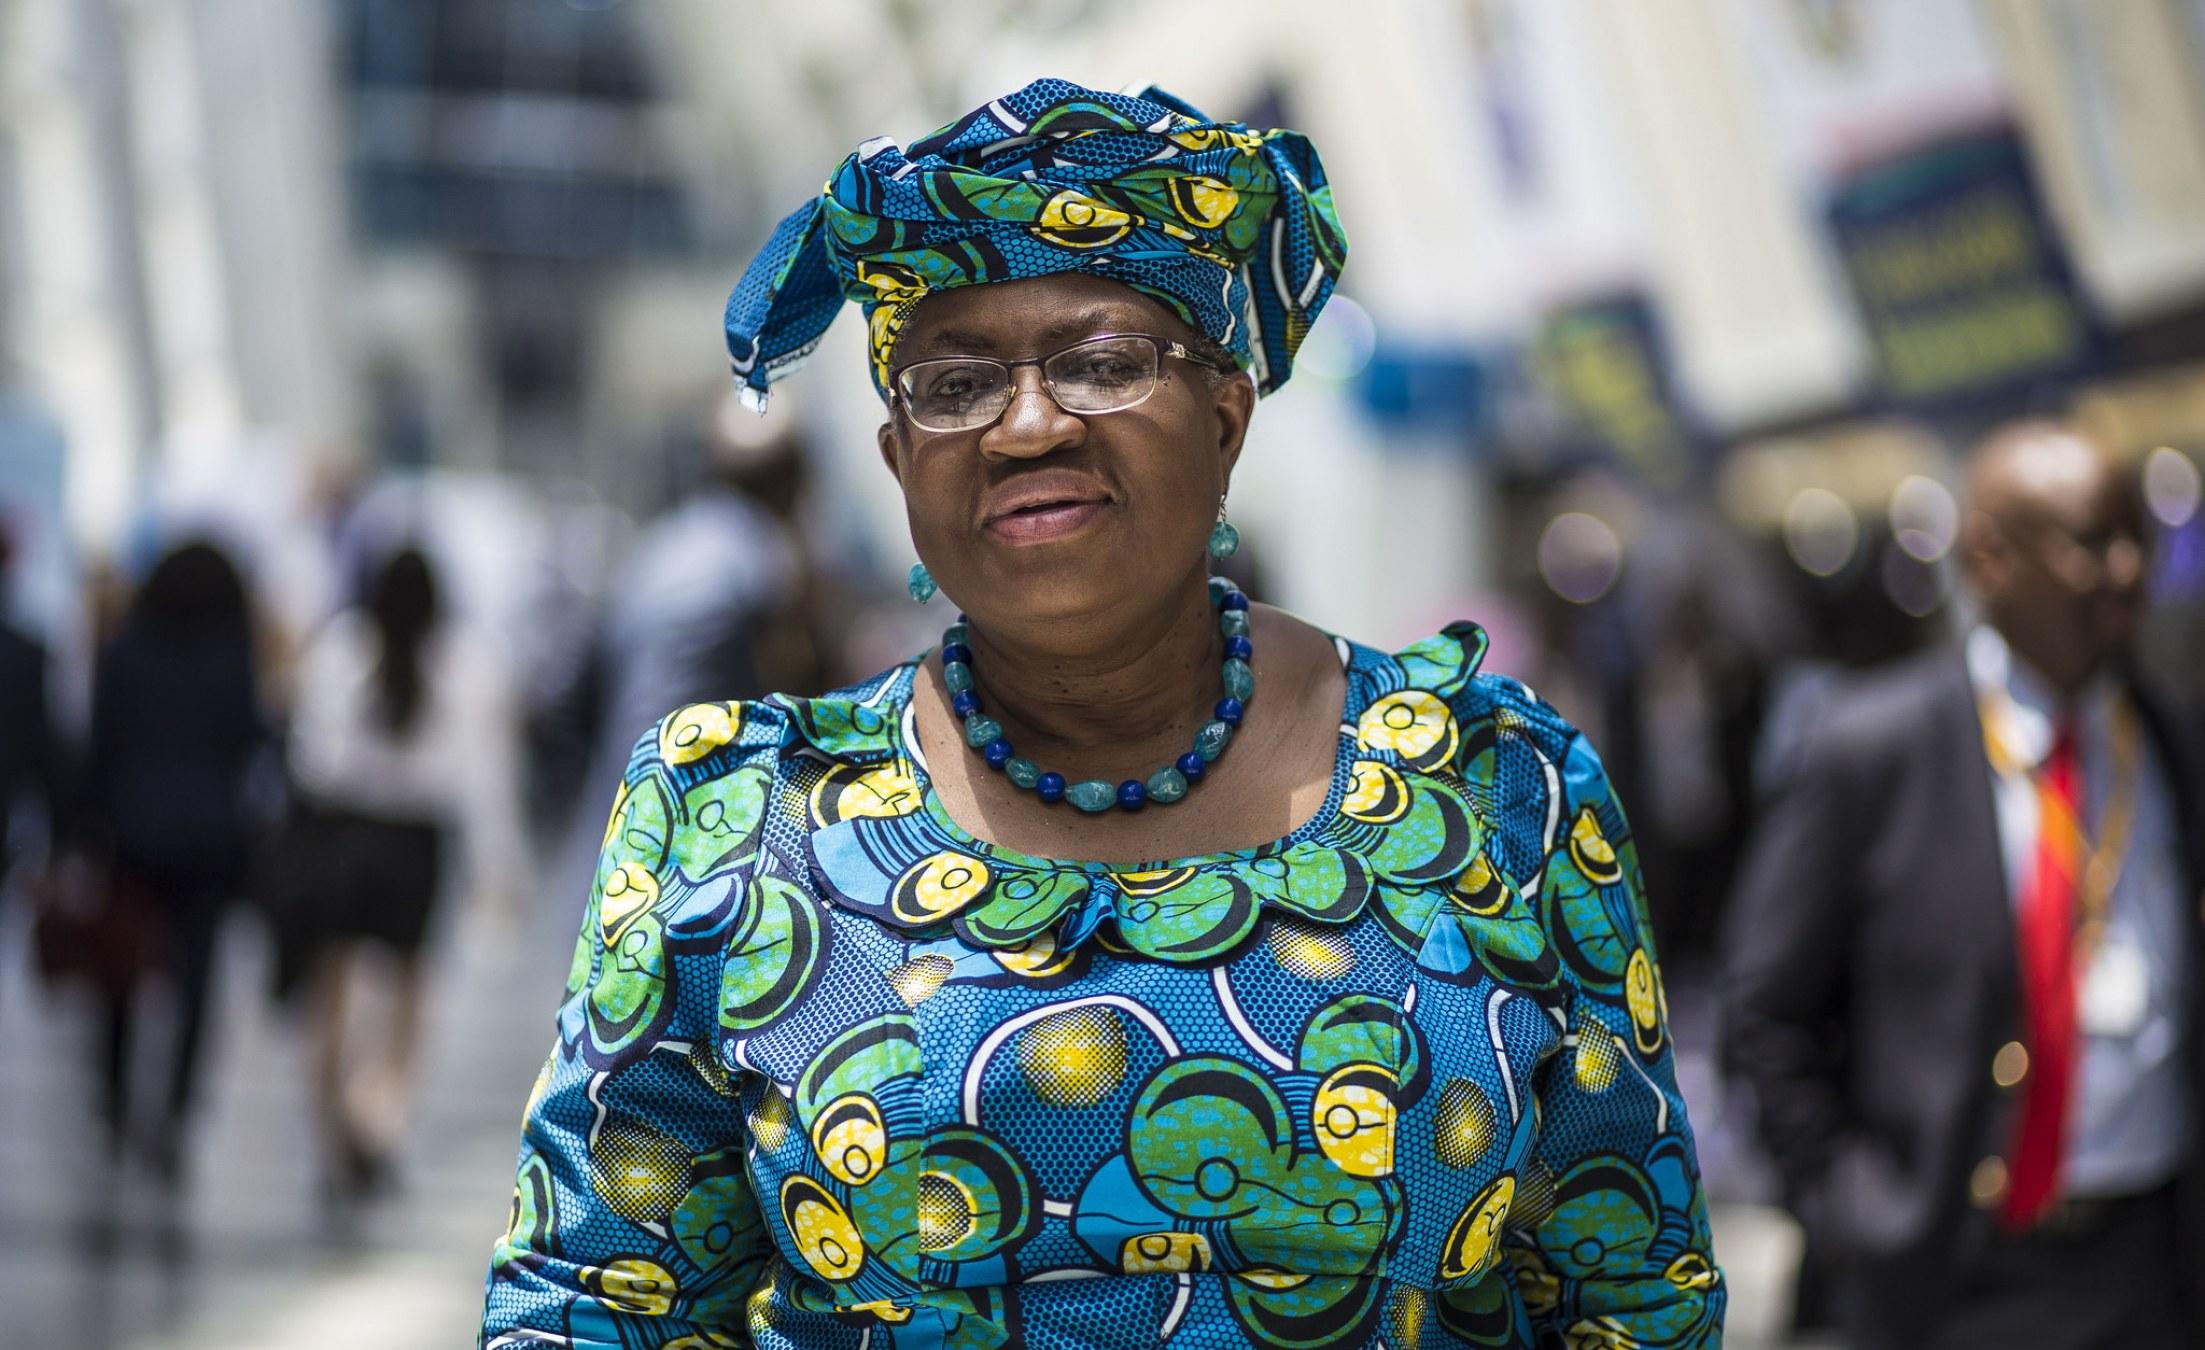 Nigeria: Okonjo-Iweala Gets to Final Stage in Race for WTO DG